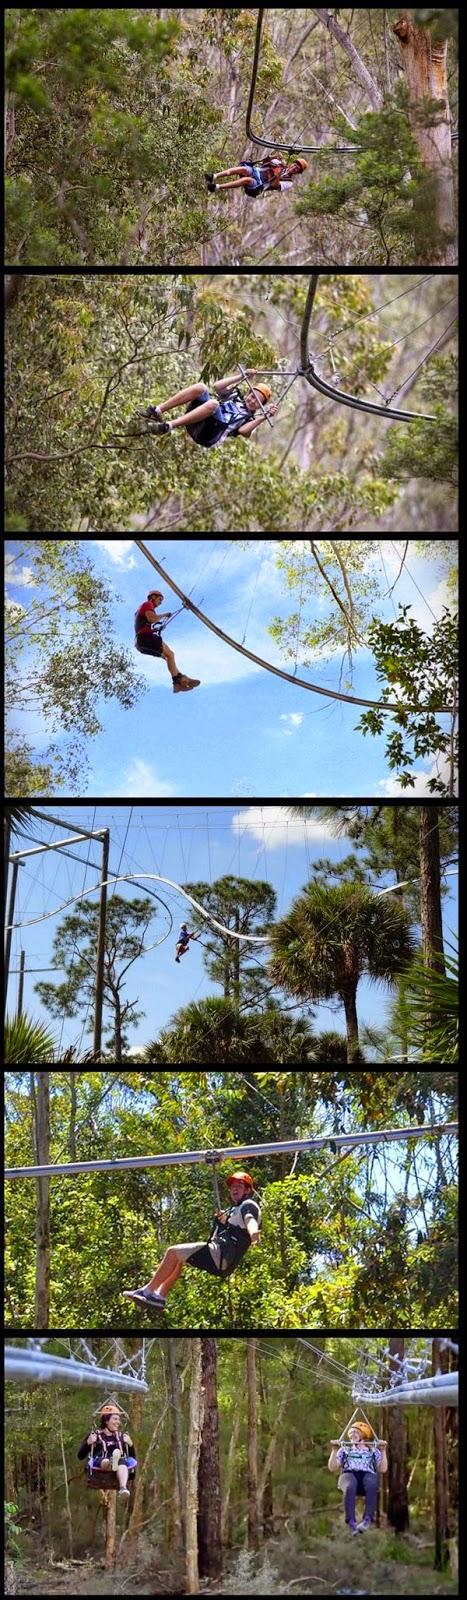 Treetop Crazy Rider: Roller Coaster Yang Digantung Pada Pohon | liataja.com